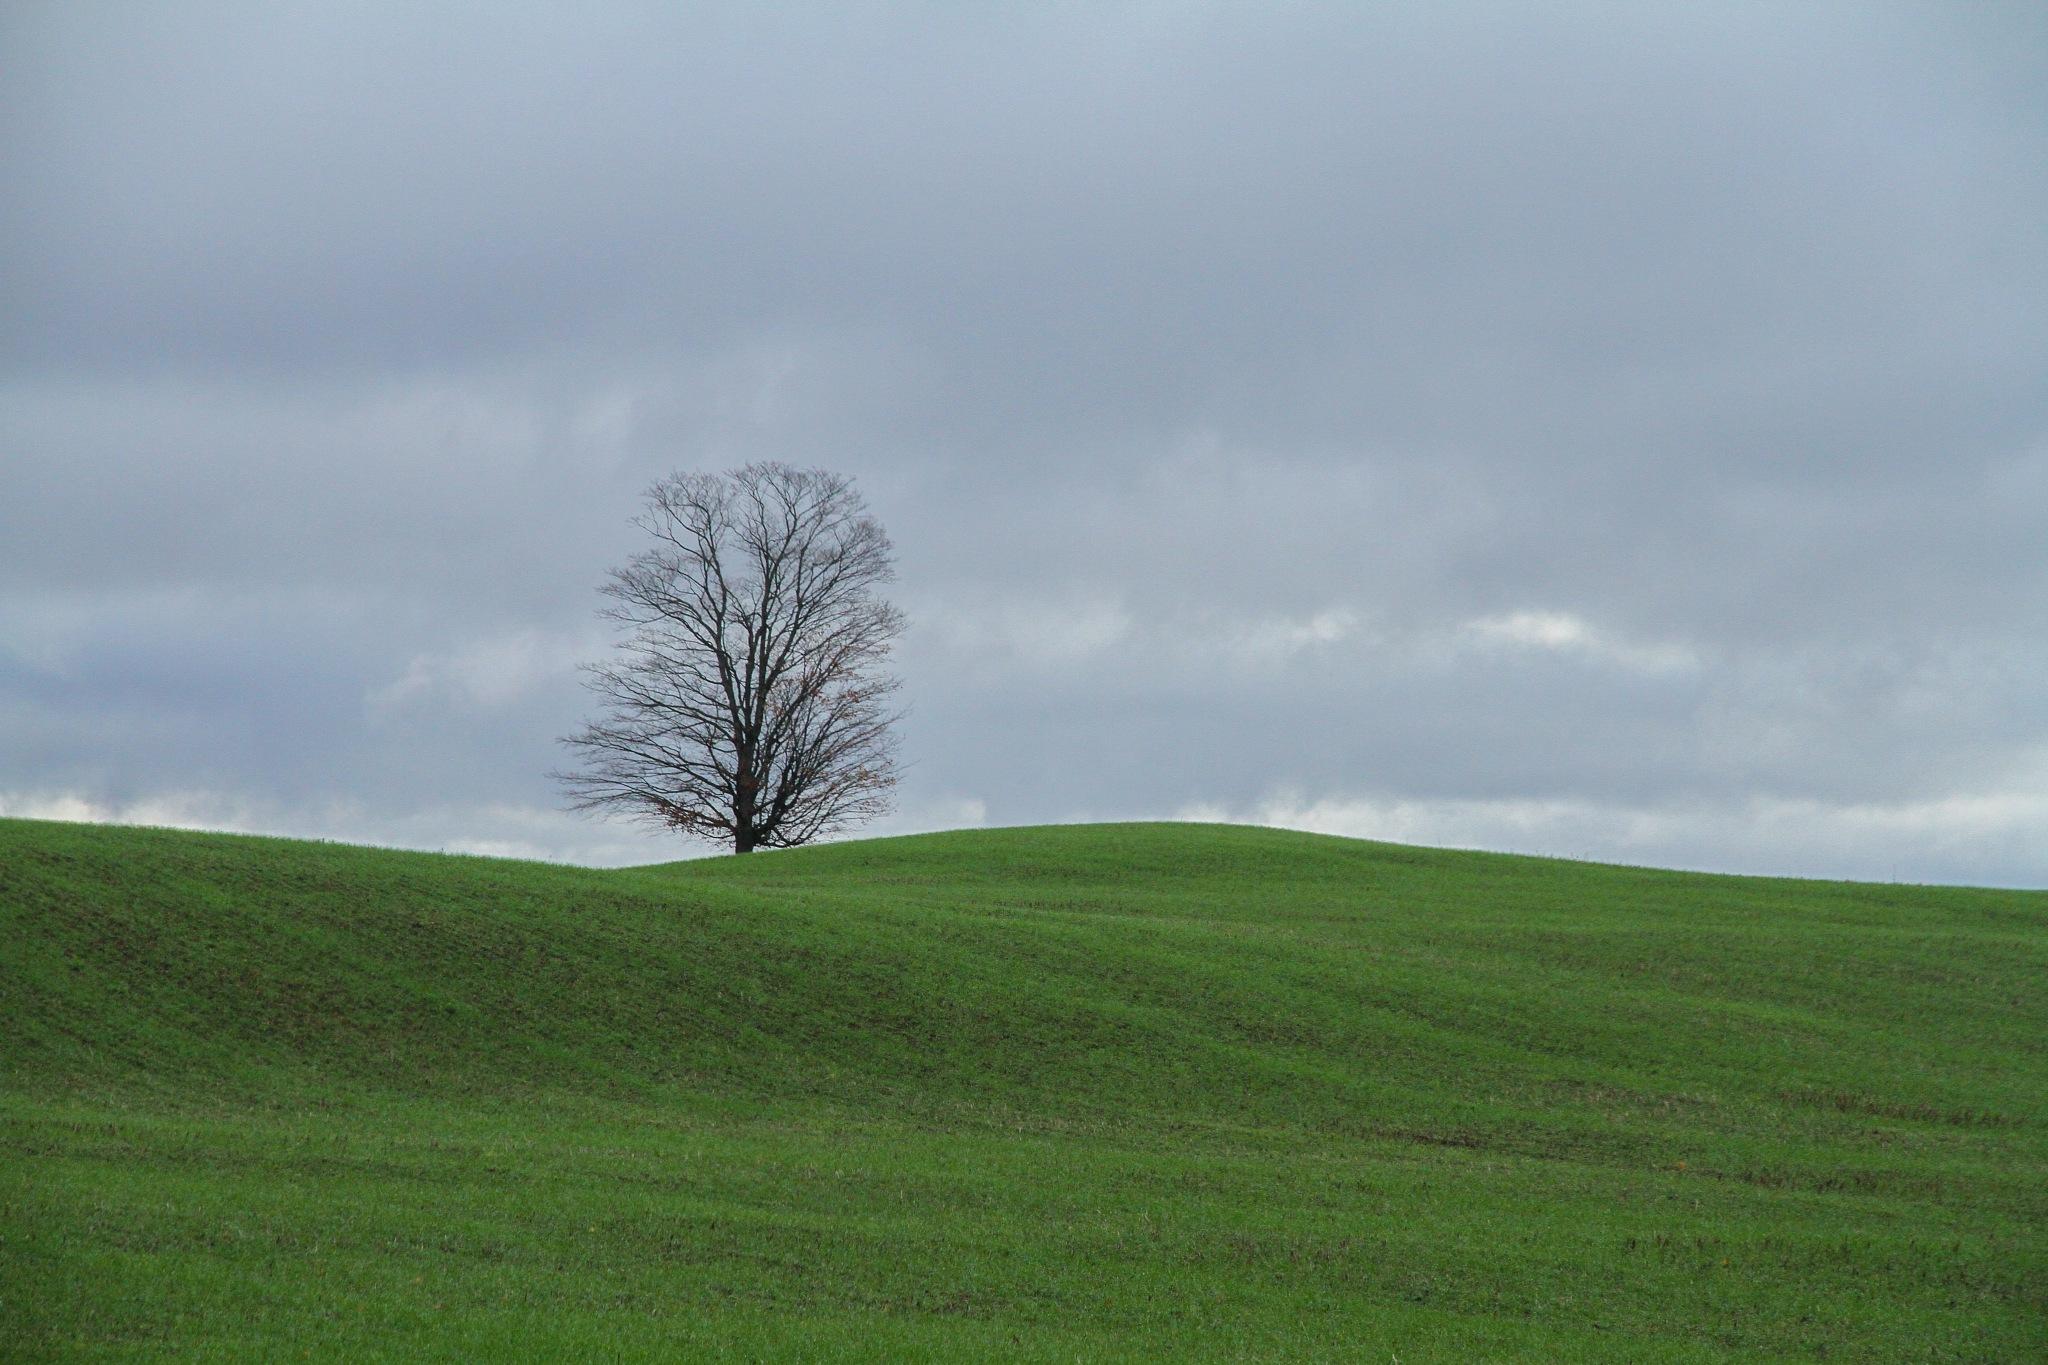 One Tree Hill by El Merrifield